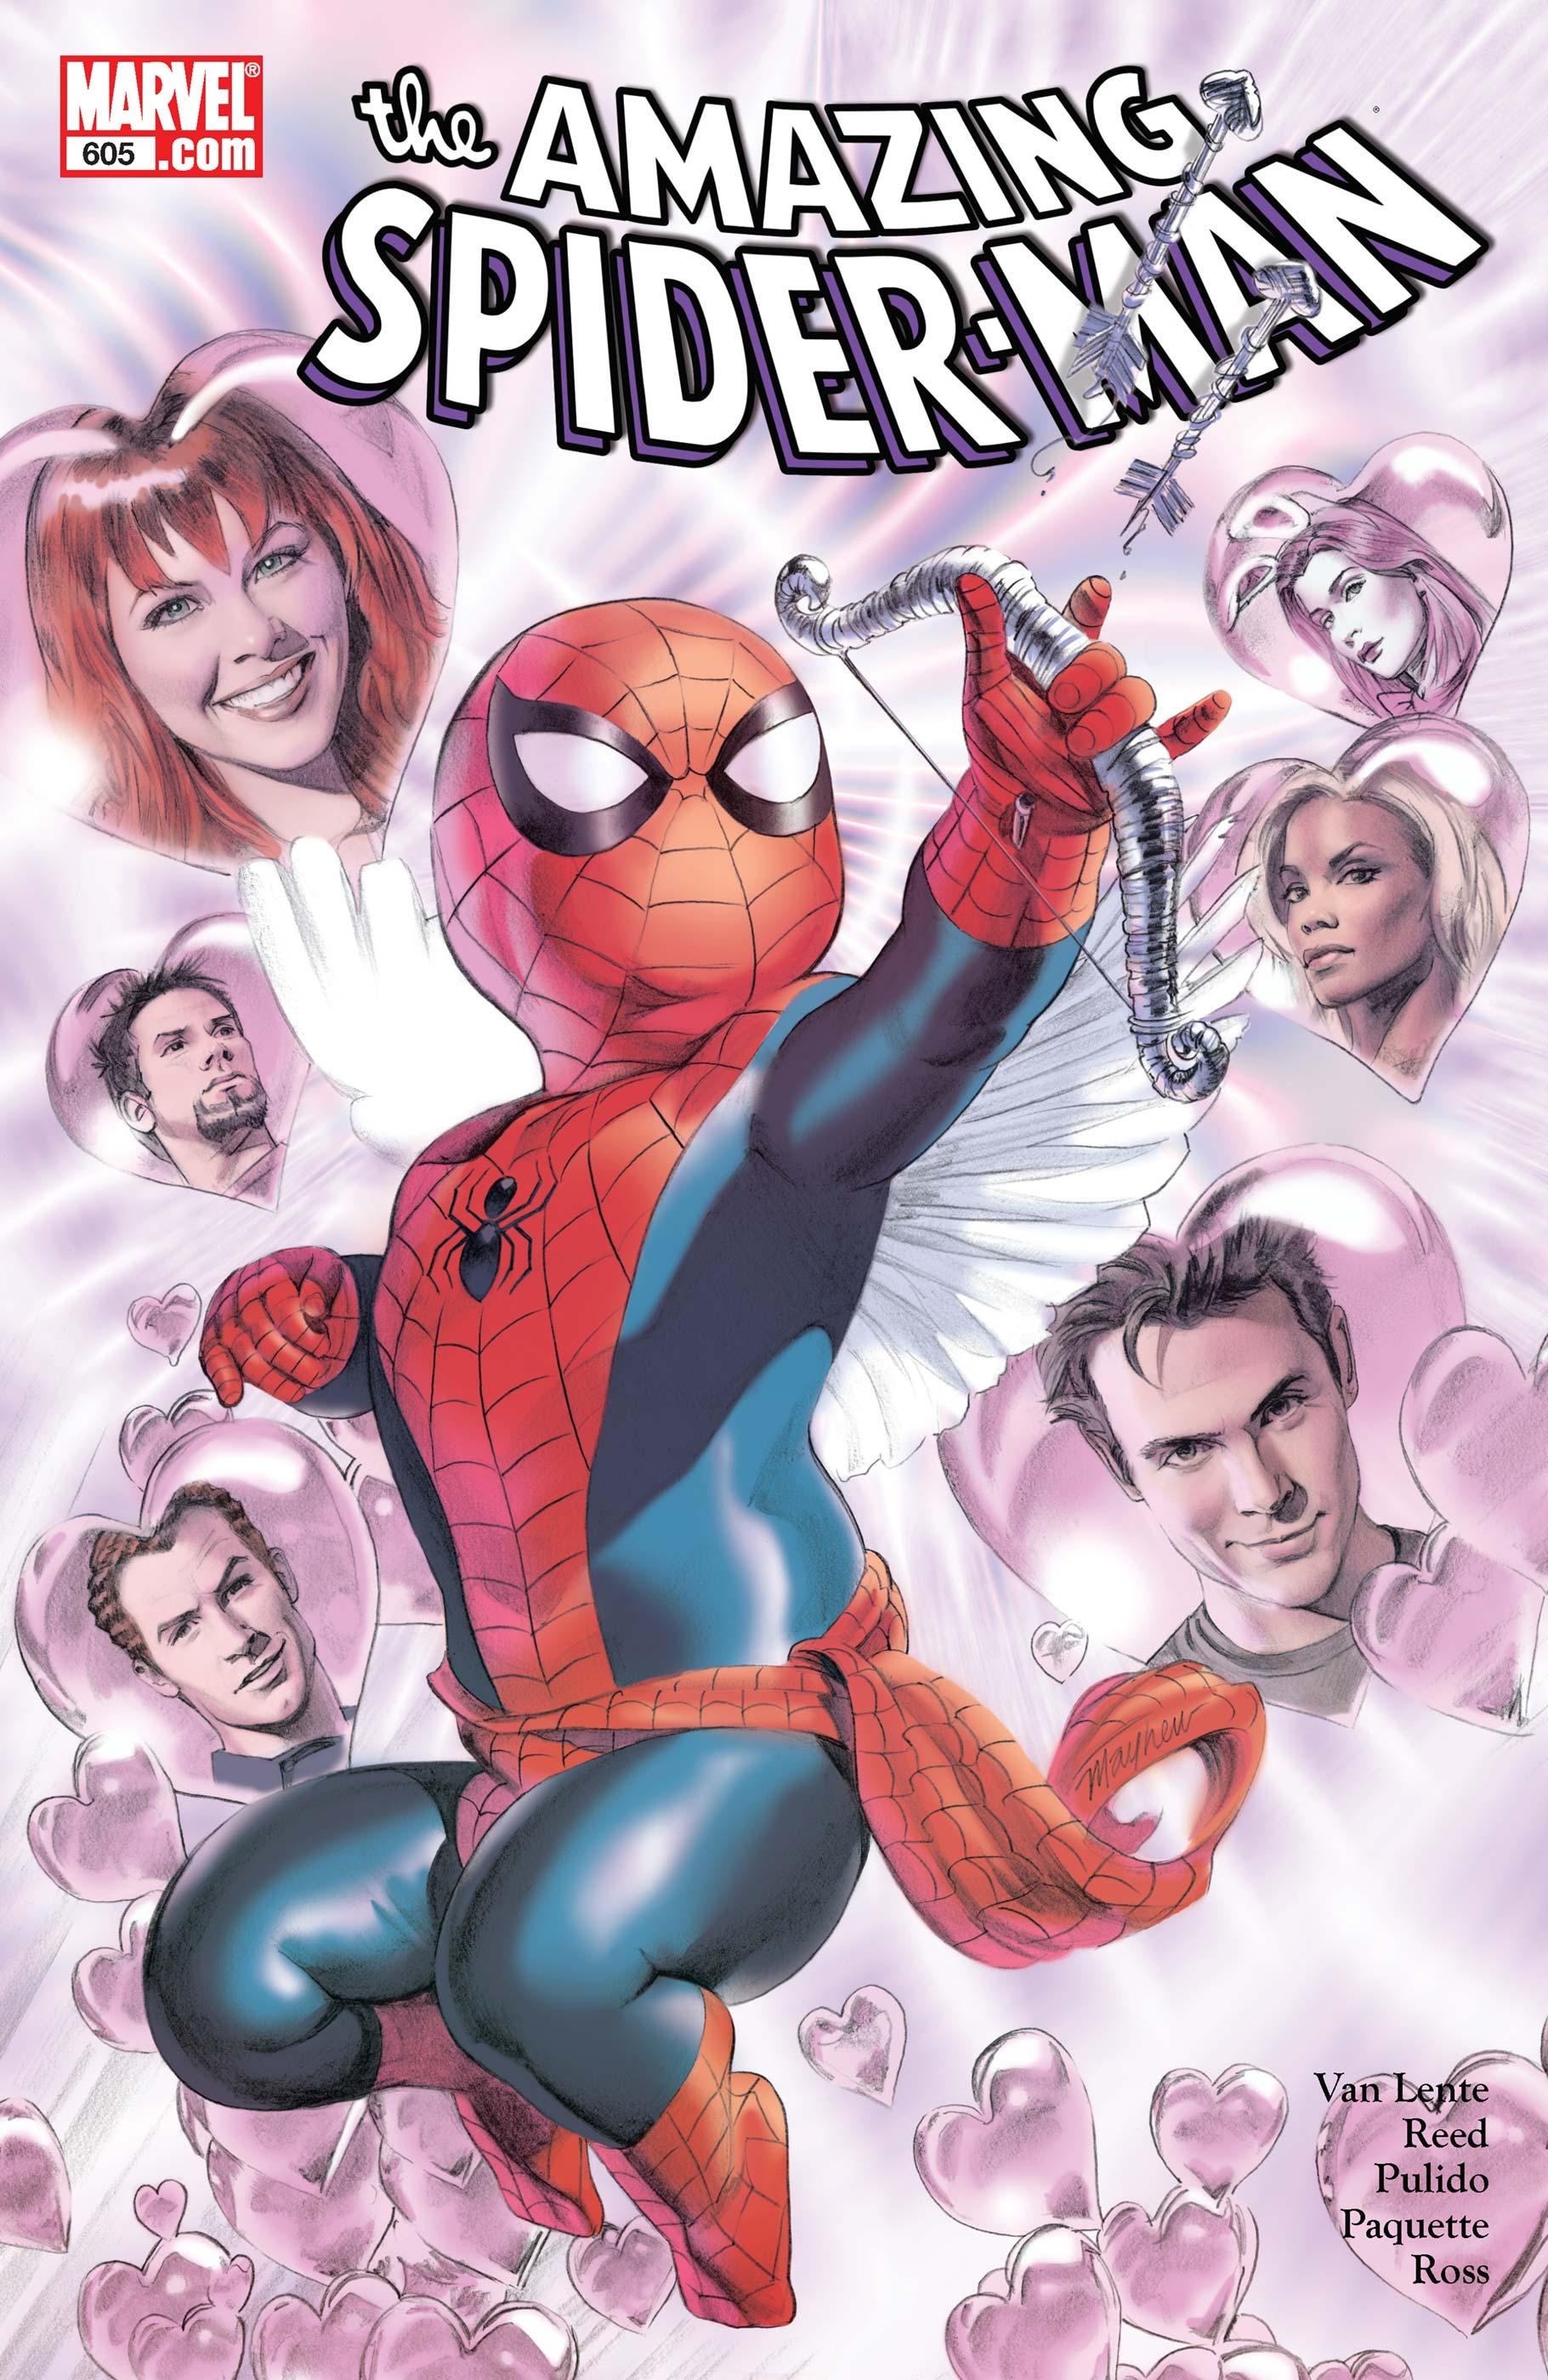 Marvel Amazing Spider-Man #605 Comic Book